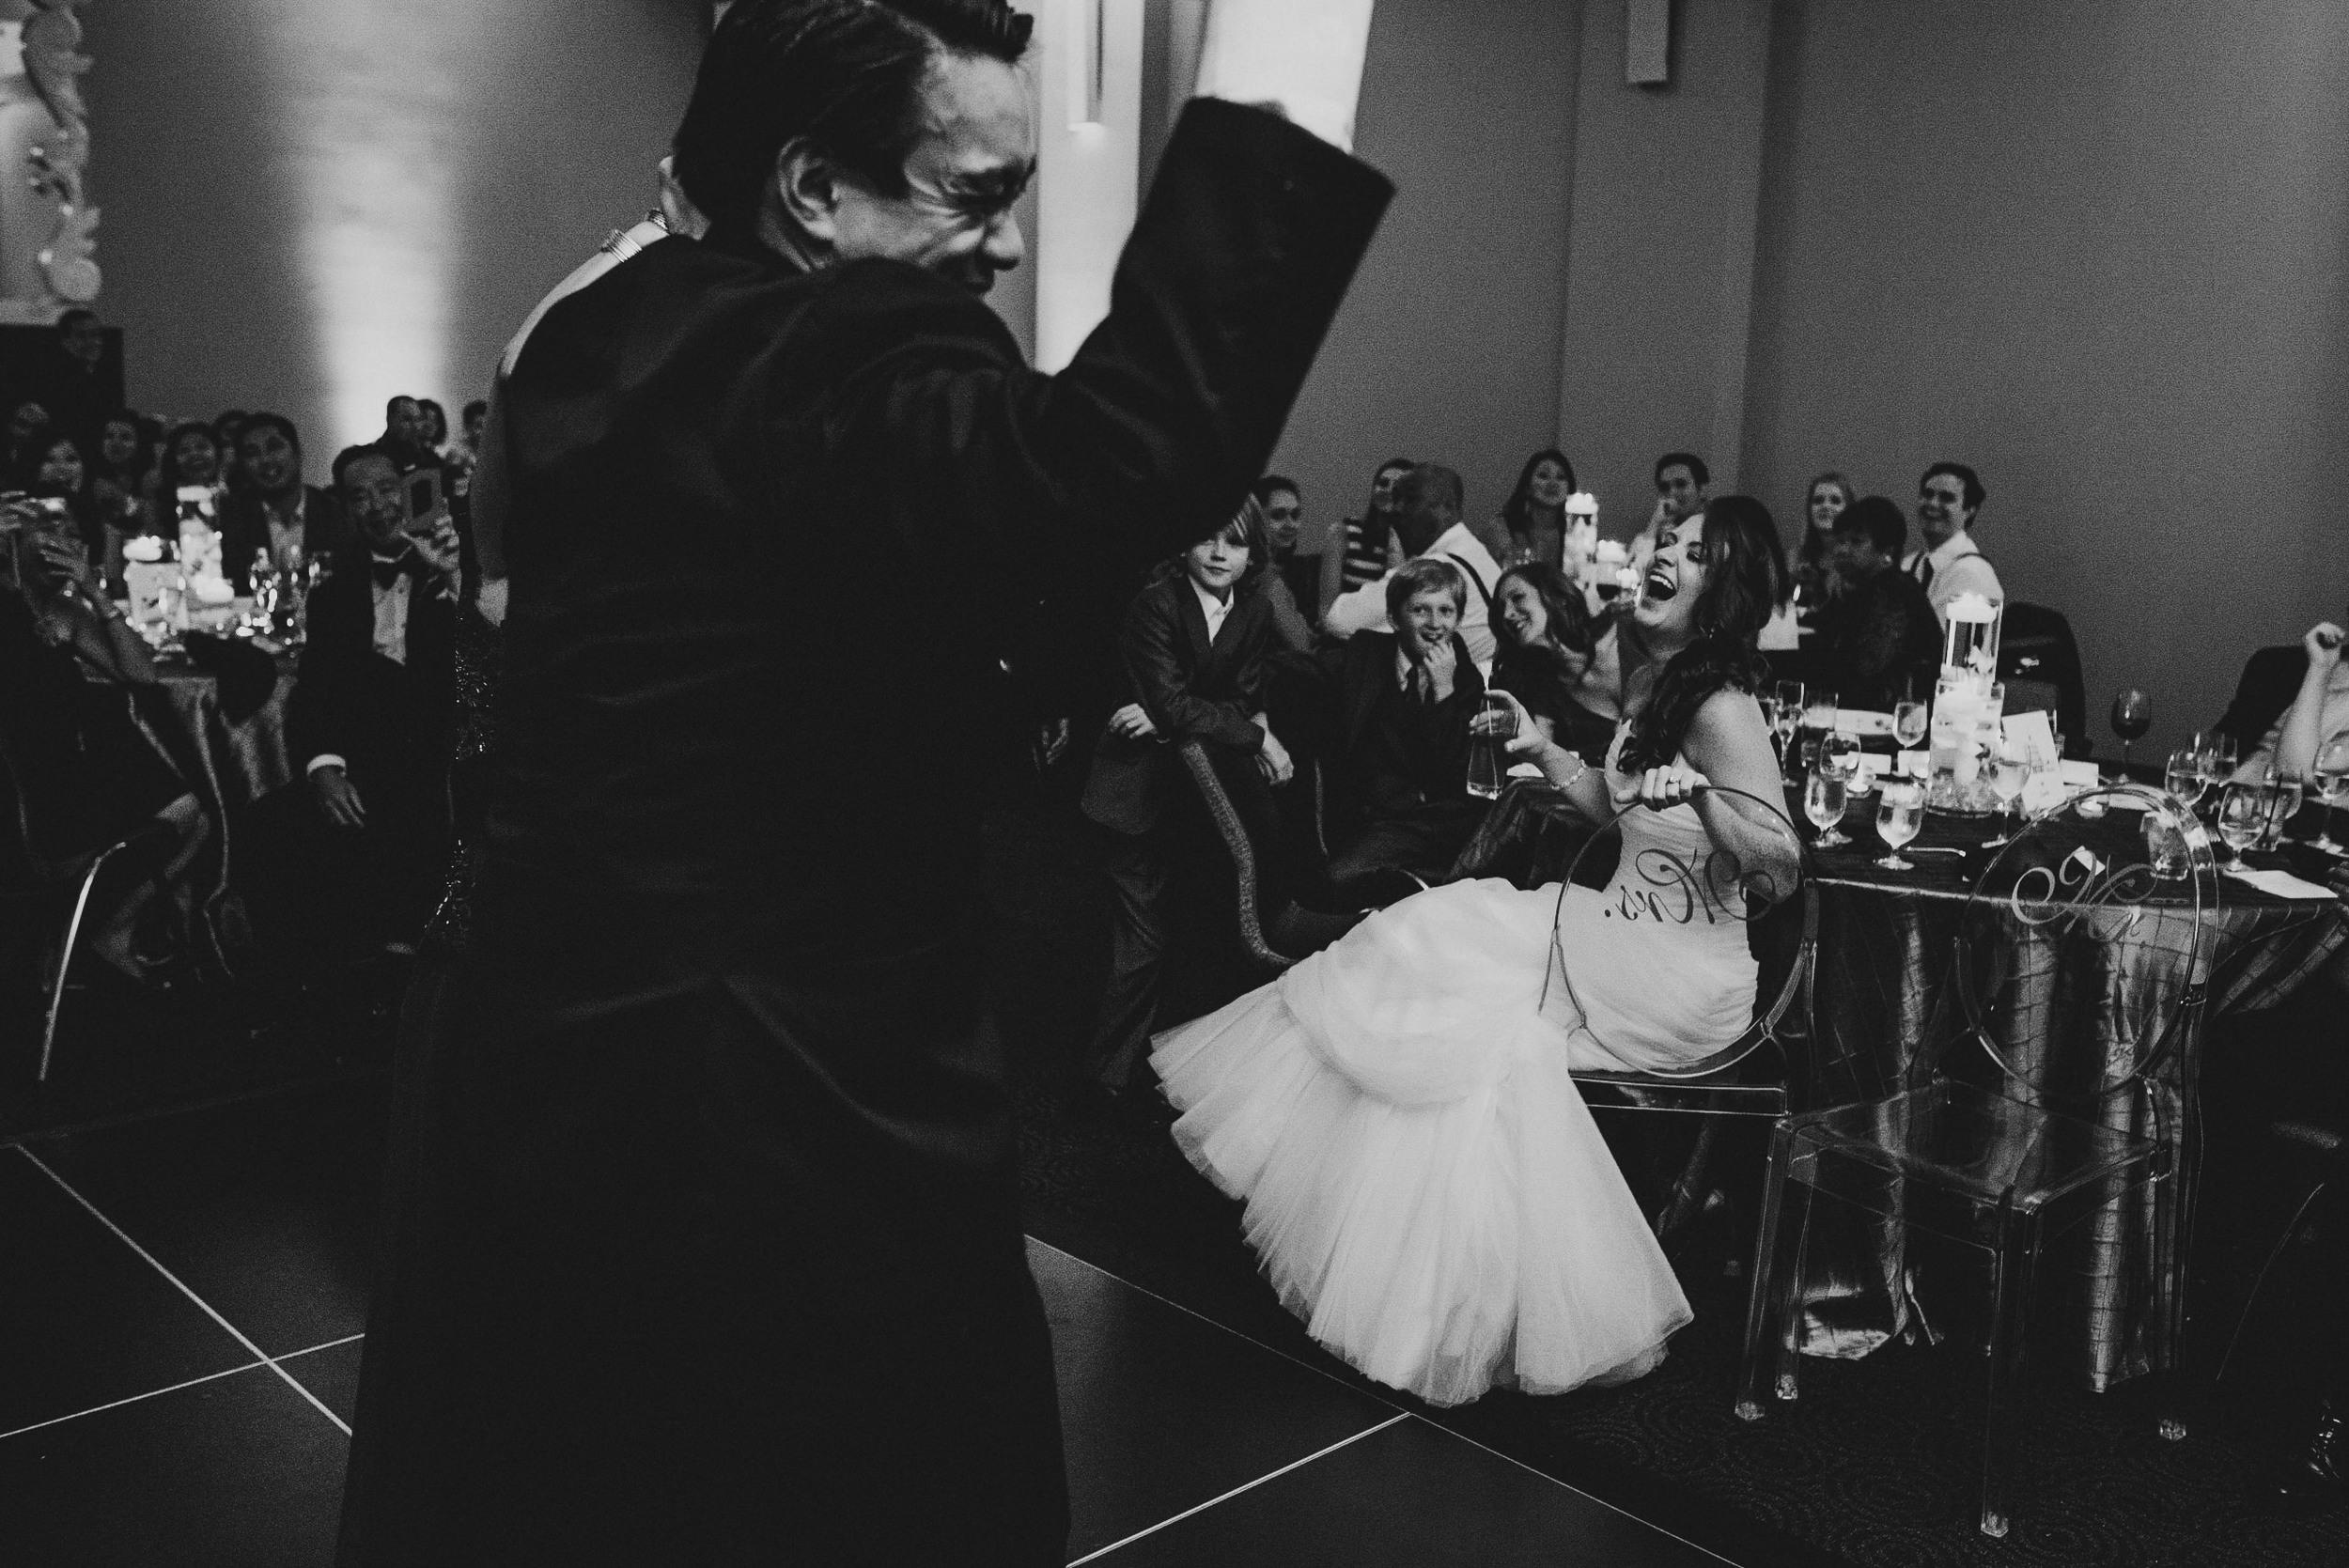 Wedding at W Hotel Washington DC by Mantas Kubilinskas-23.jpg